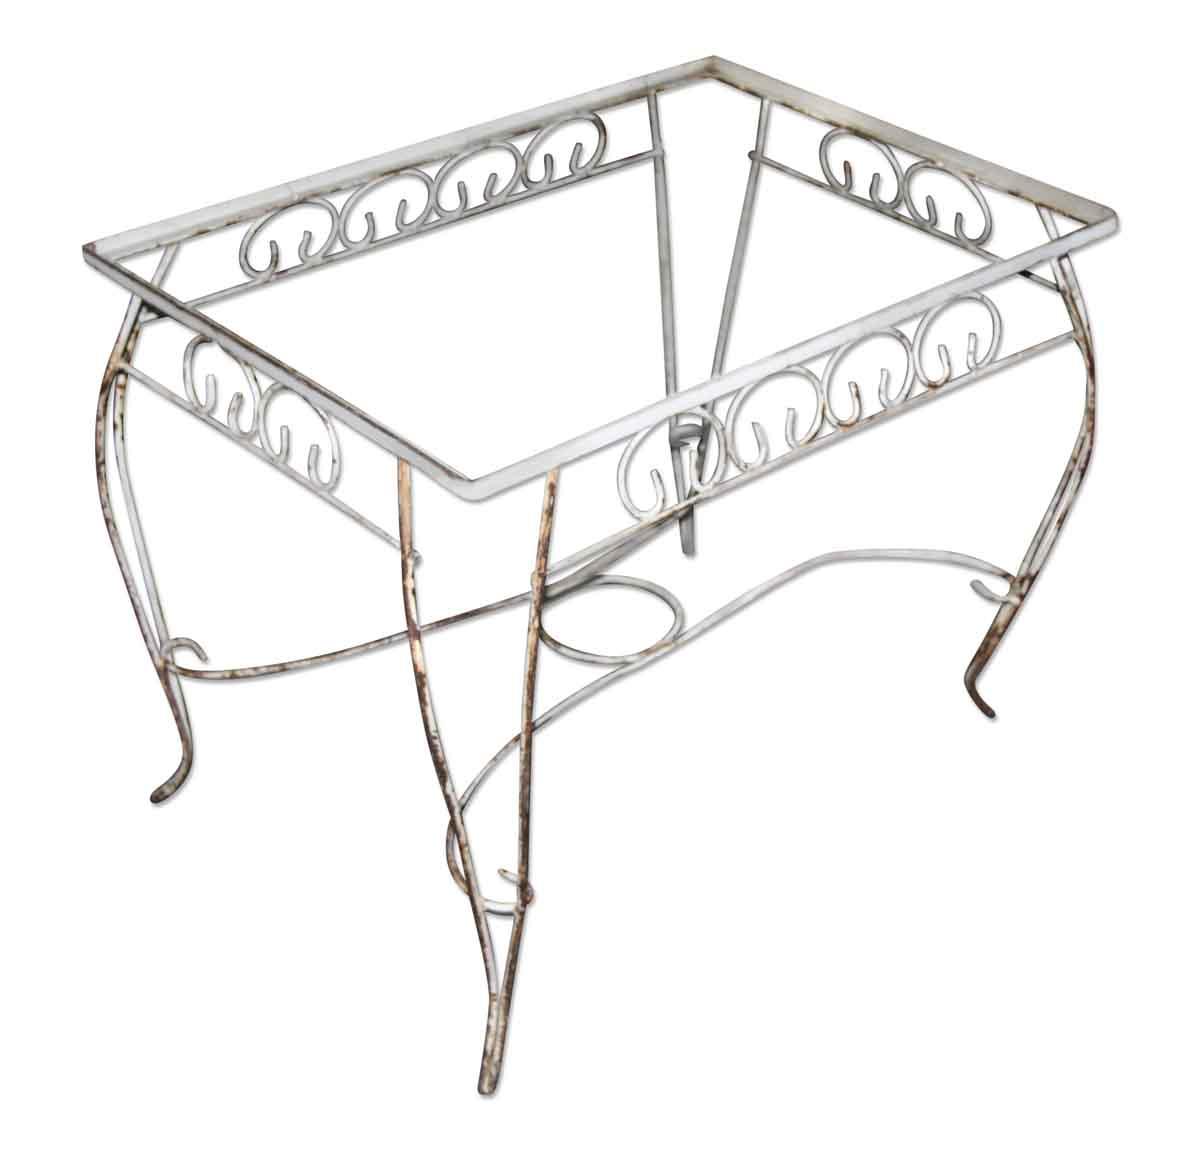 Antique Patio Table Base